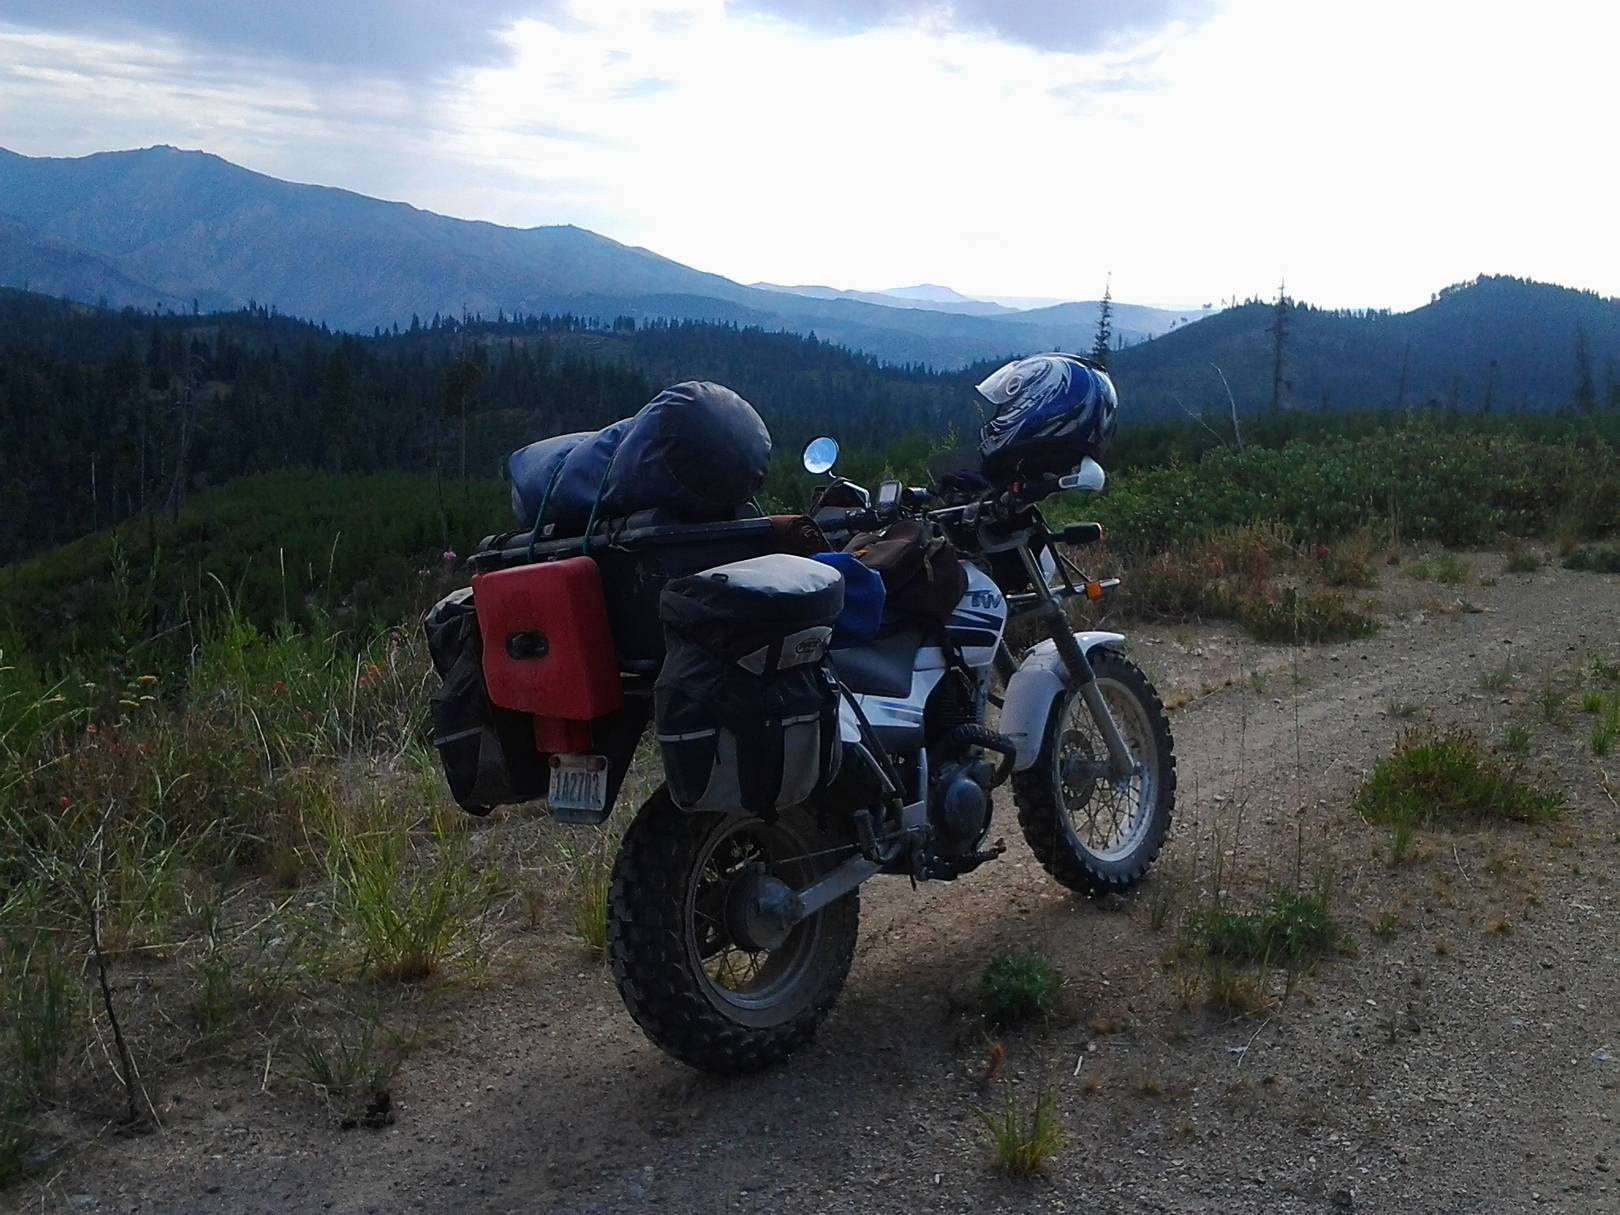 2012 birthday weekend ride 0819120942